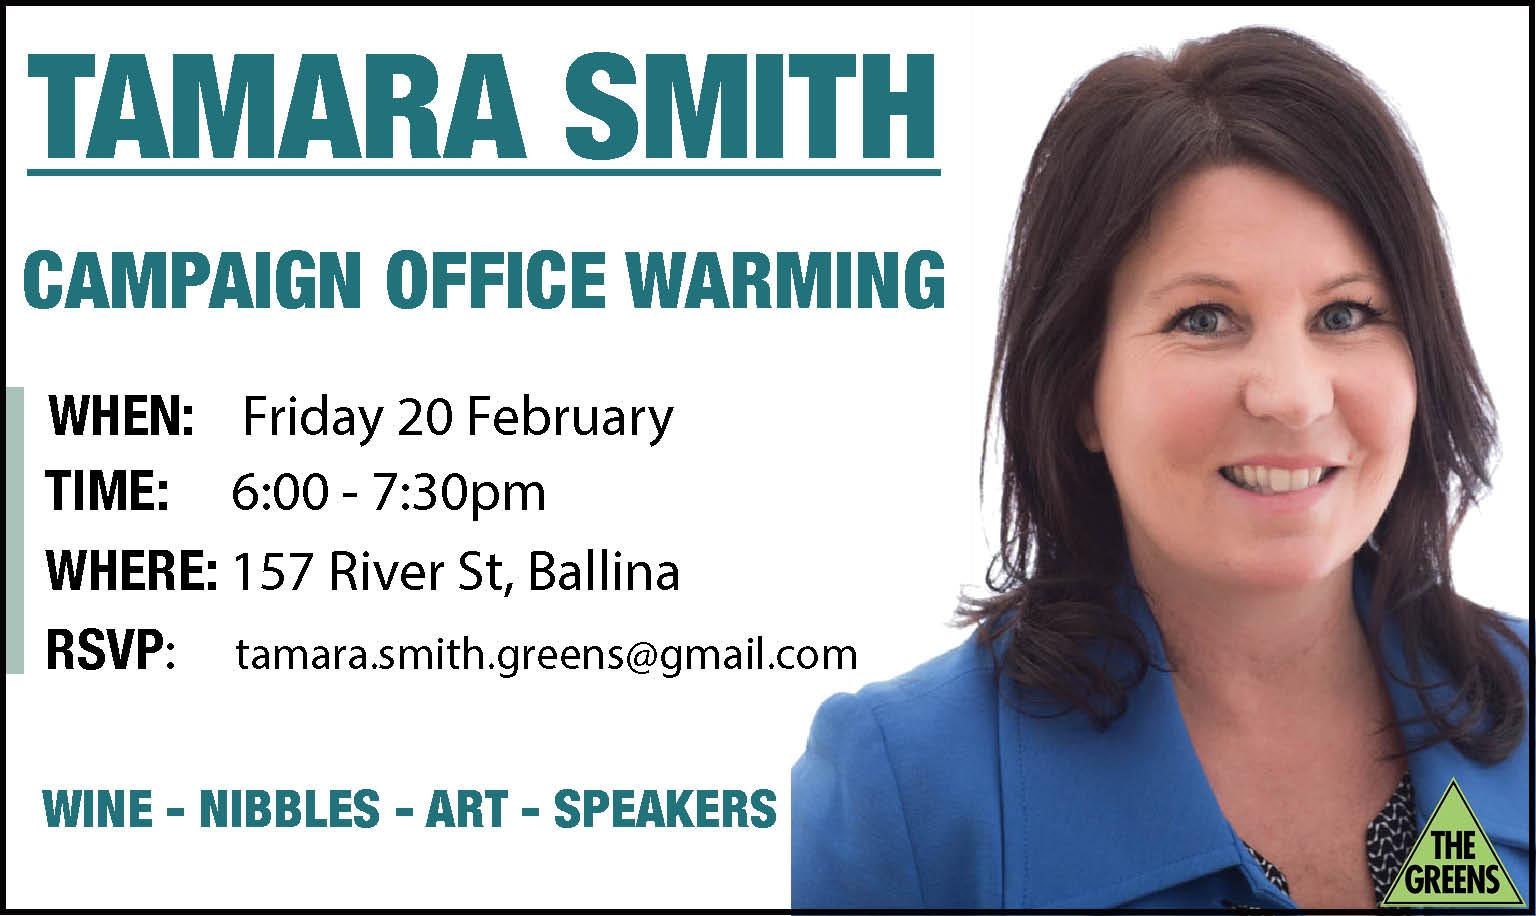 Office_Warming_Invite_-_Tamara_Smith.jpg